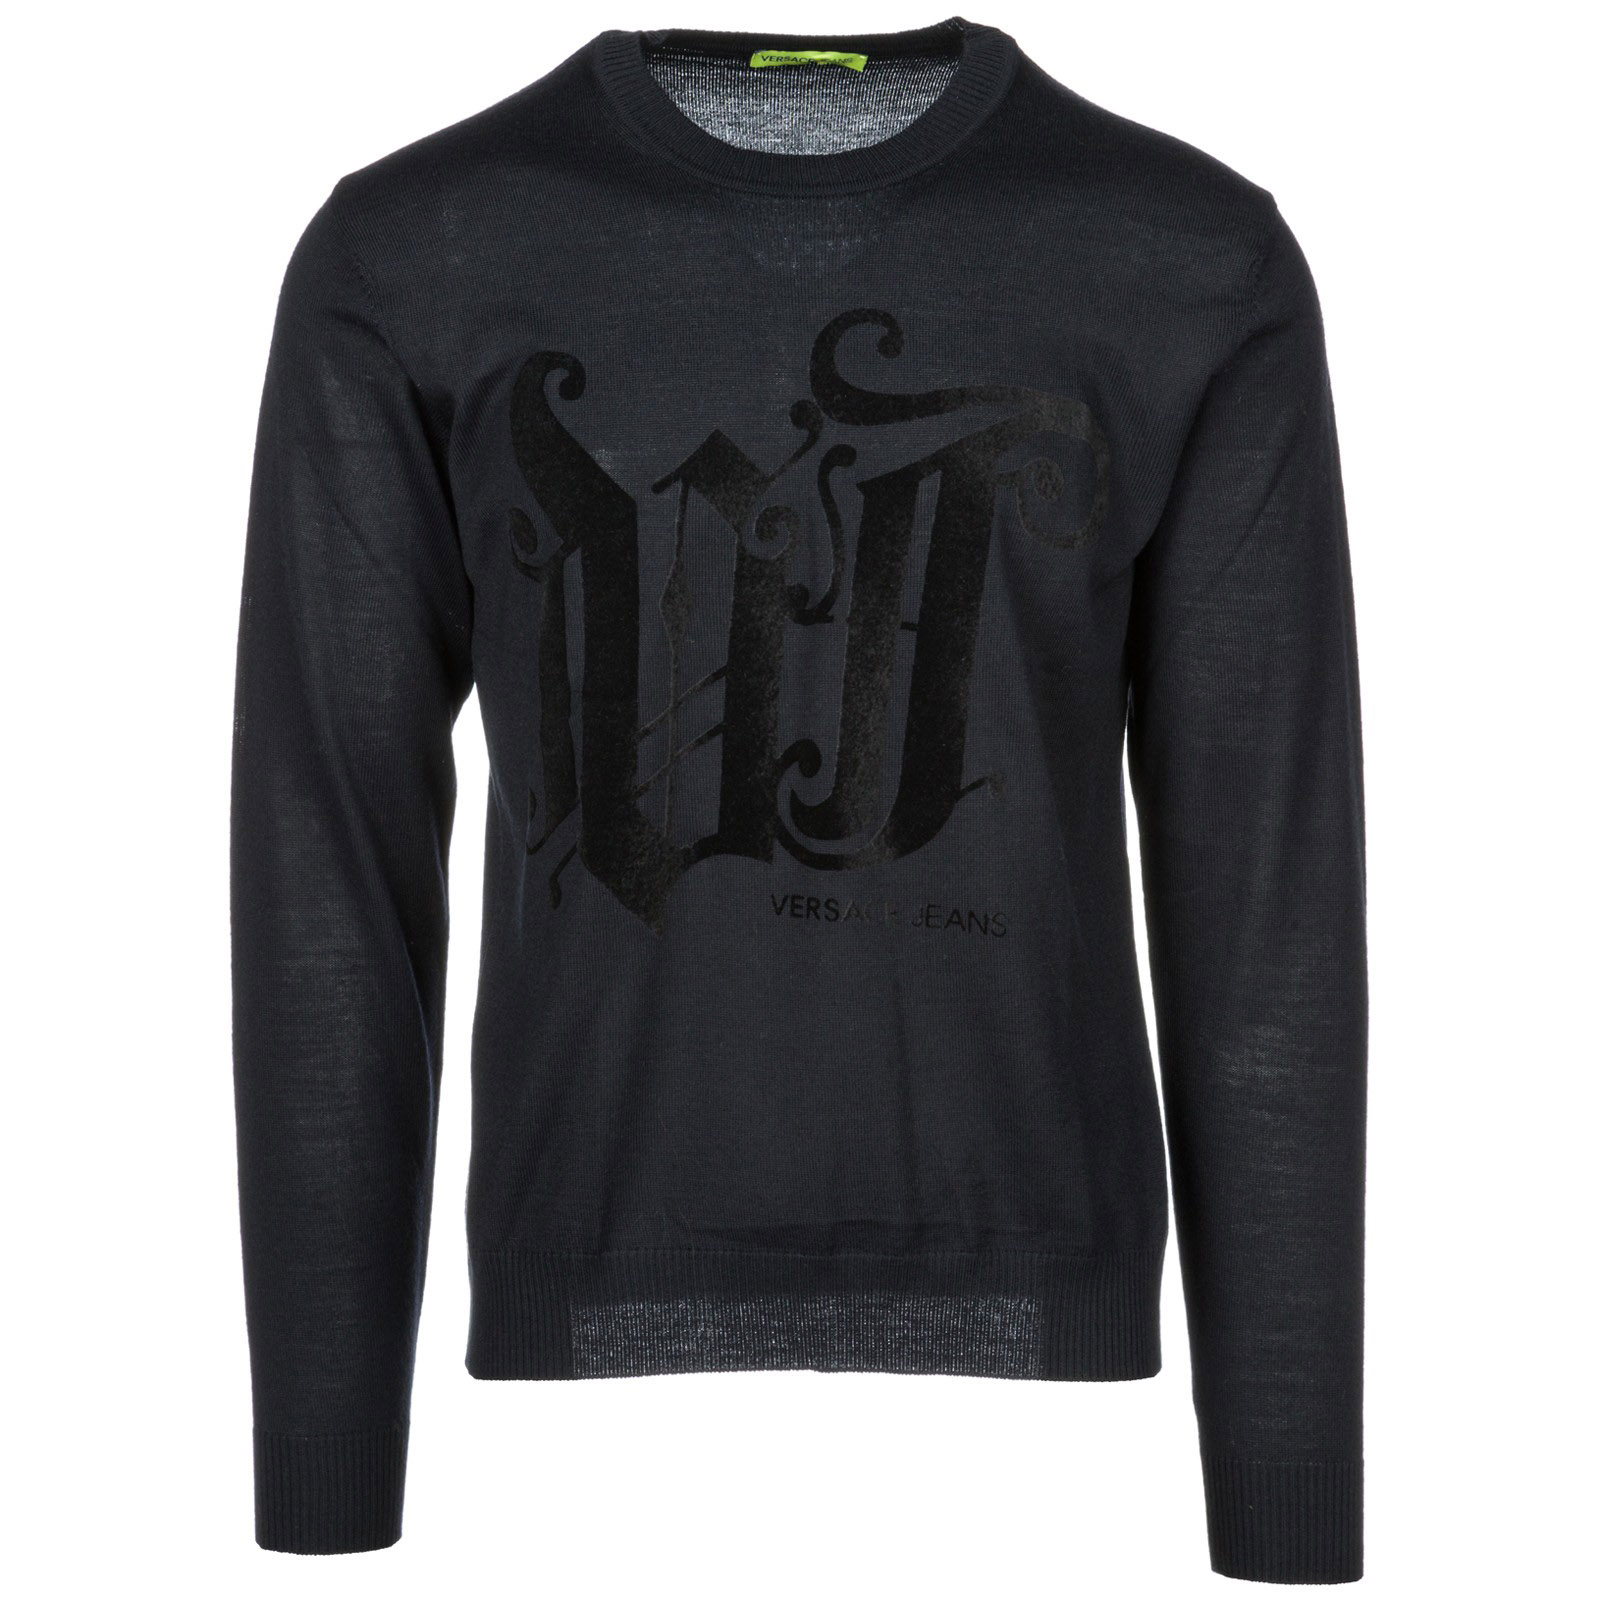 VERSACE JEANS Men'S Crew Neck Neckline Jumper Sweater Pullover in Blue